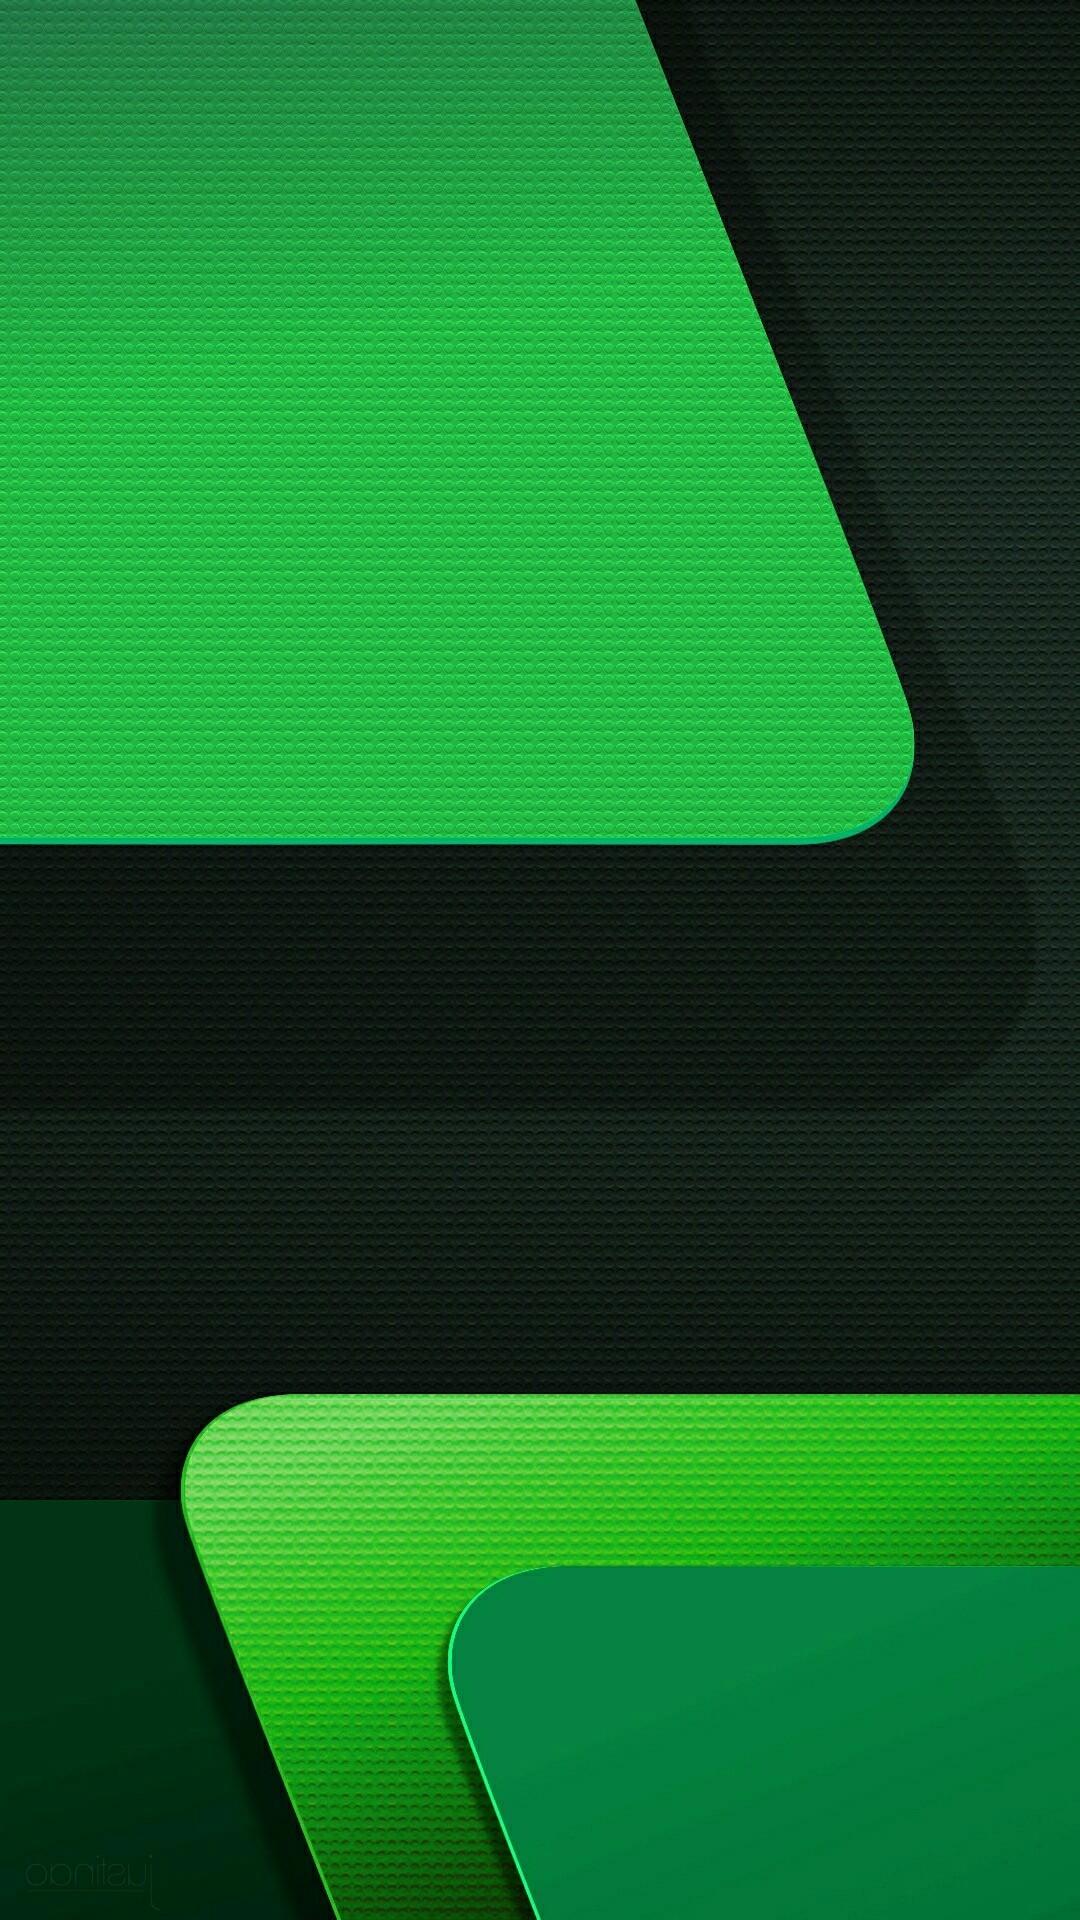 Green Wallpaper, Wallpaper Art, Iphone Wallpaper, Material Design, Iphone  Se, Phone Backgrounds, Wall Papers, Cartoons, Texture